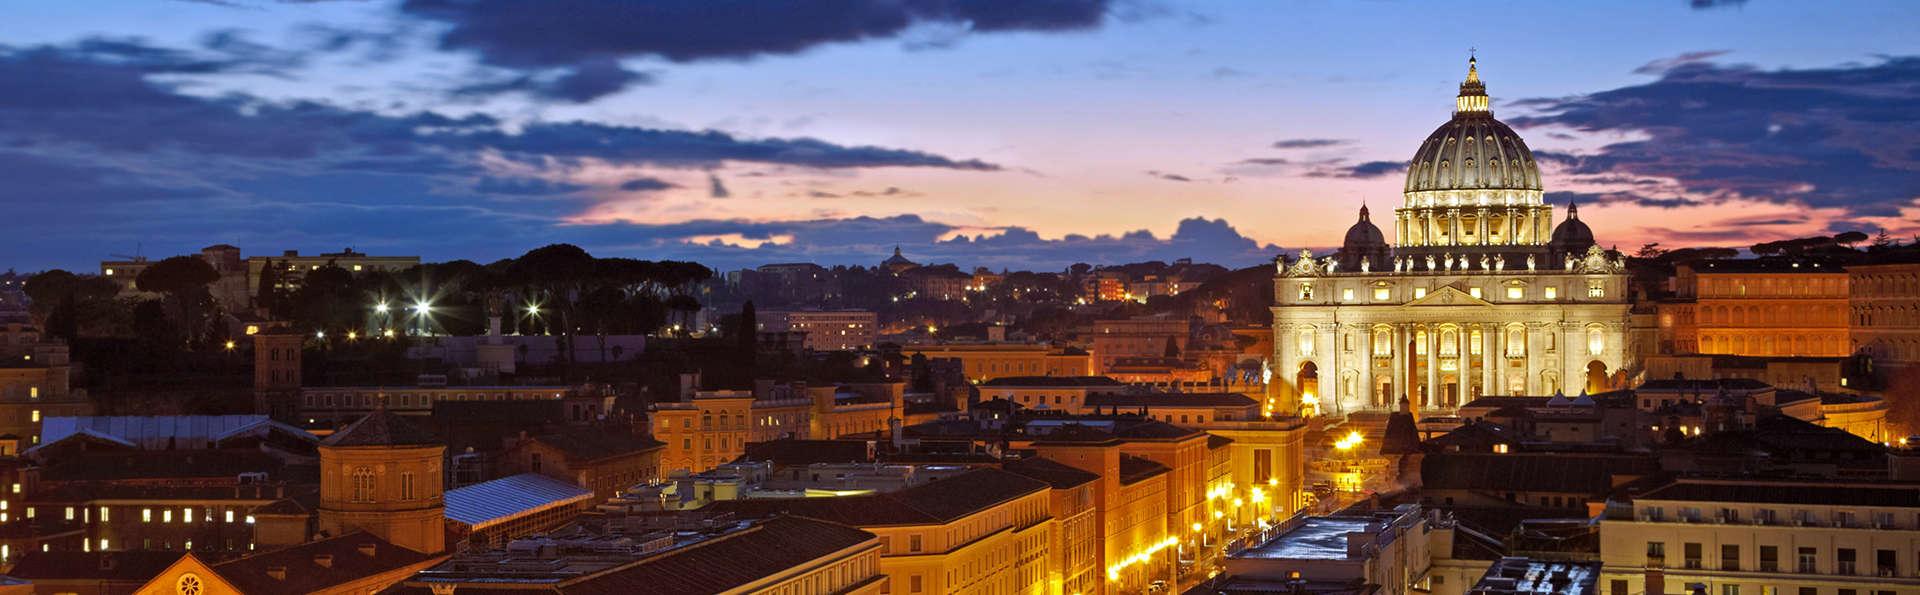 hotel il cantico 4 rome italie. Black Bedroom Furniture Sets. Home Design Ideas